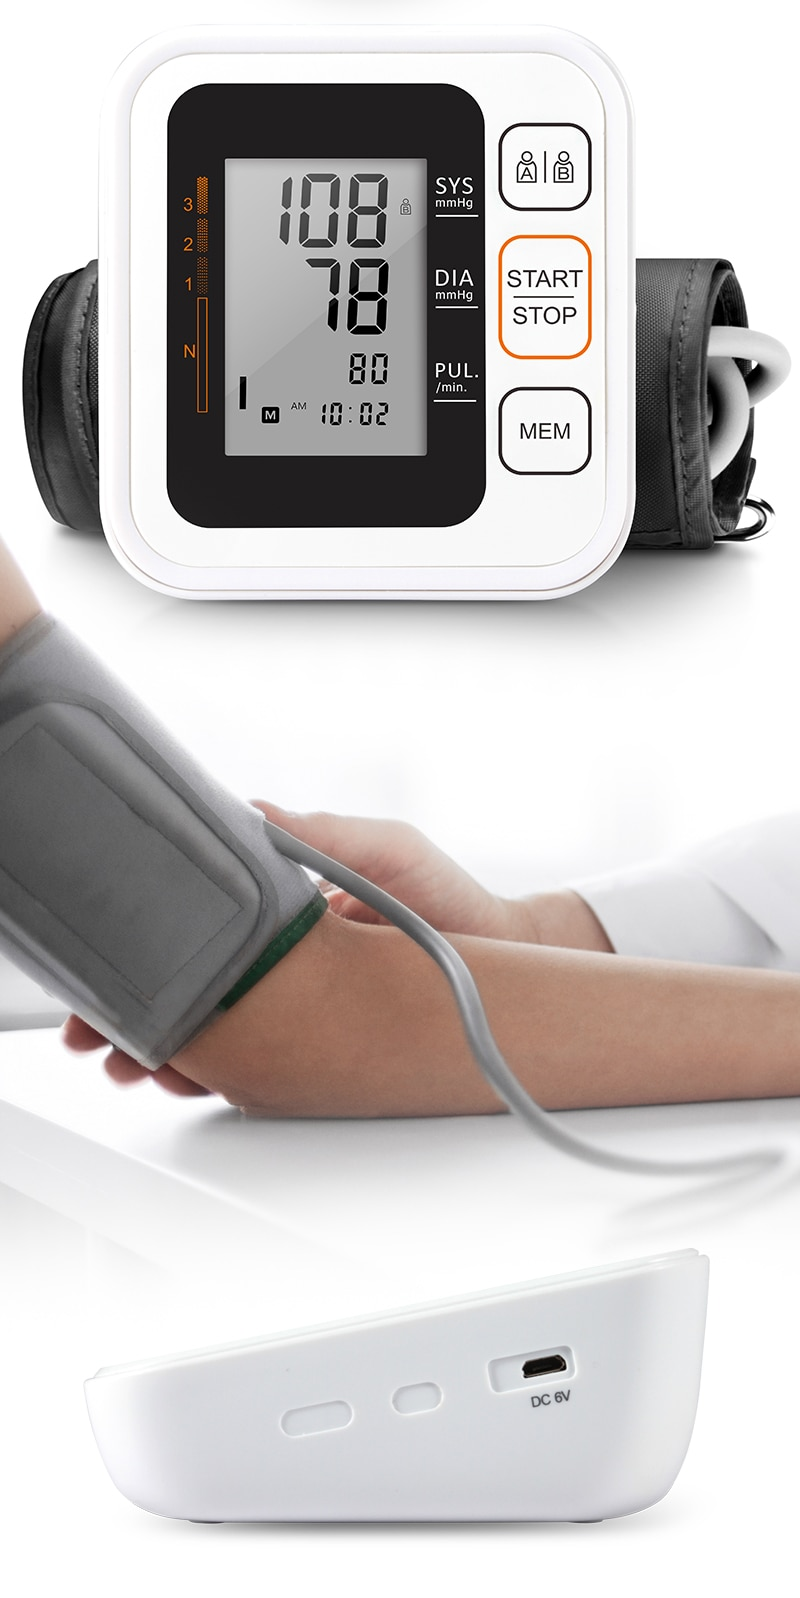 Cigii Portable Digital Upper Arm Blood Pressure Monitor Heartbeat test Health care monitor 2 Cuff Tonometer